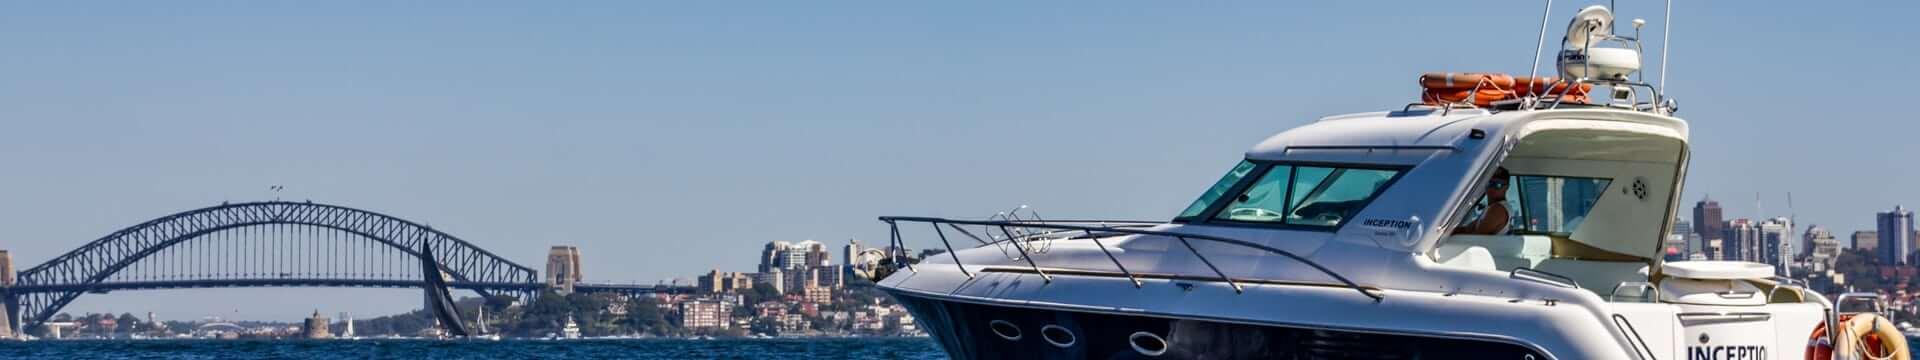 inception-boat-sydney-2